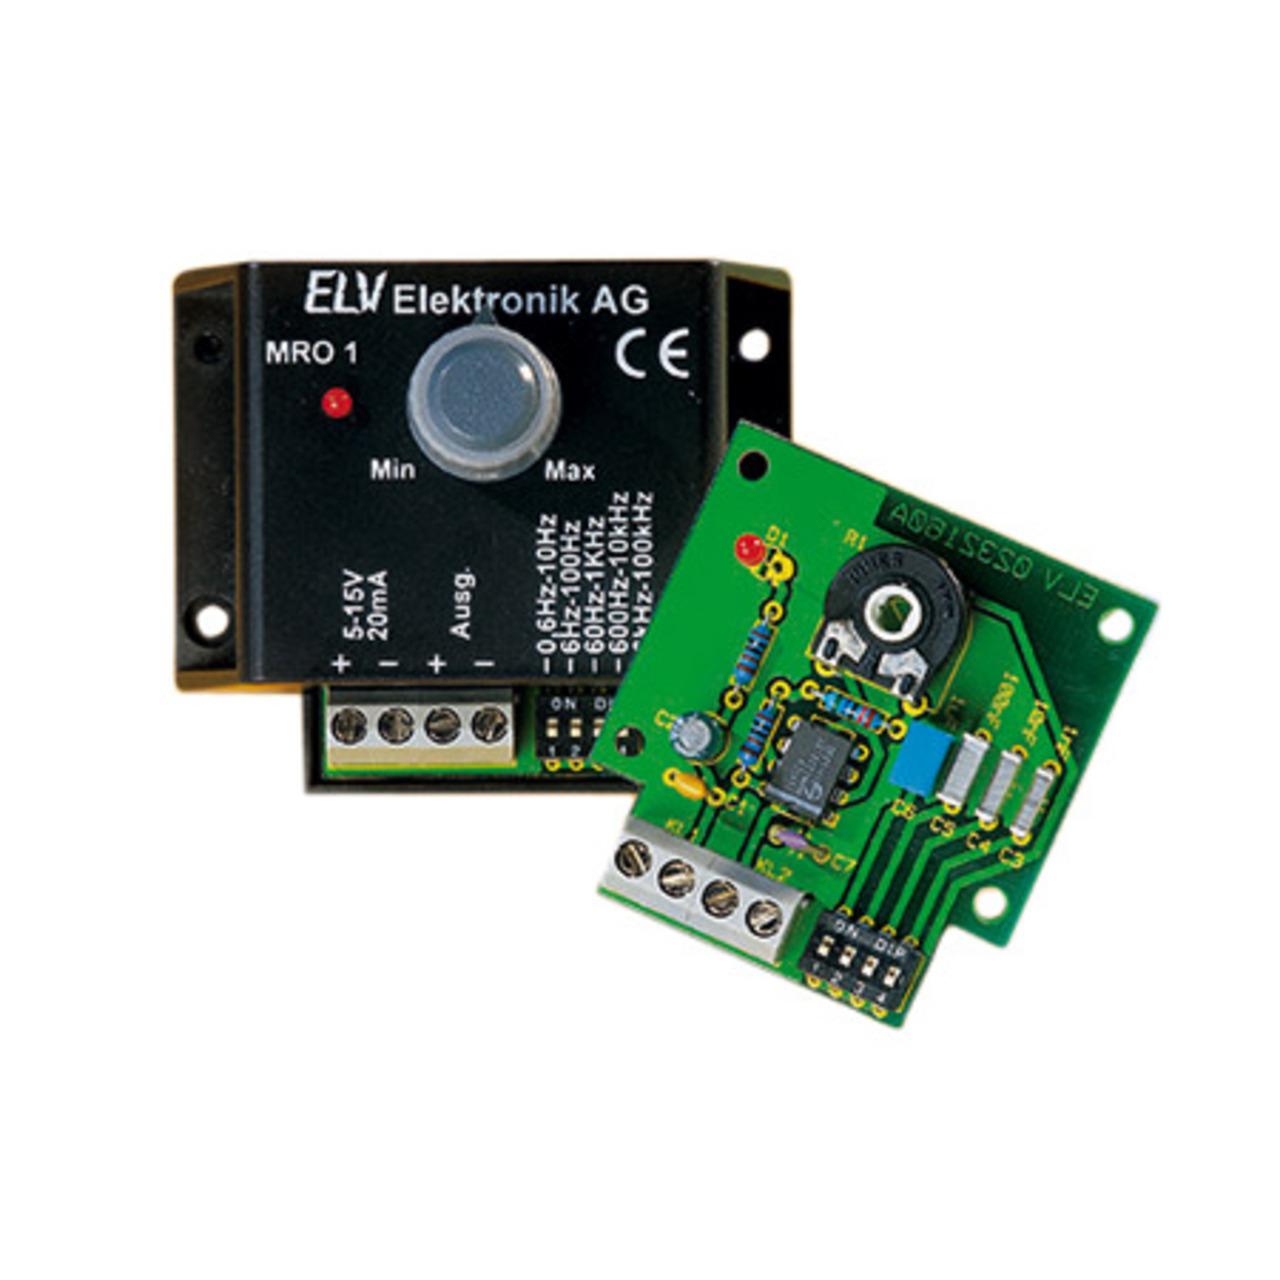 ELV Bausatz Mini-Rechteckoszillator MRO 1 047581